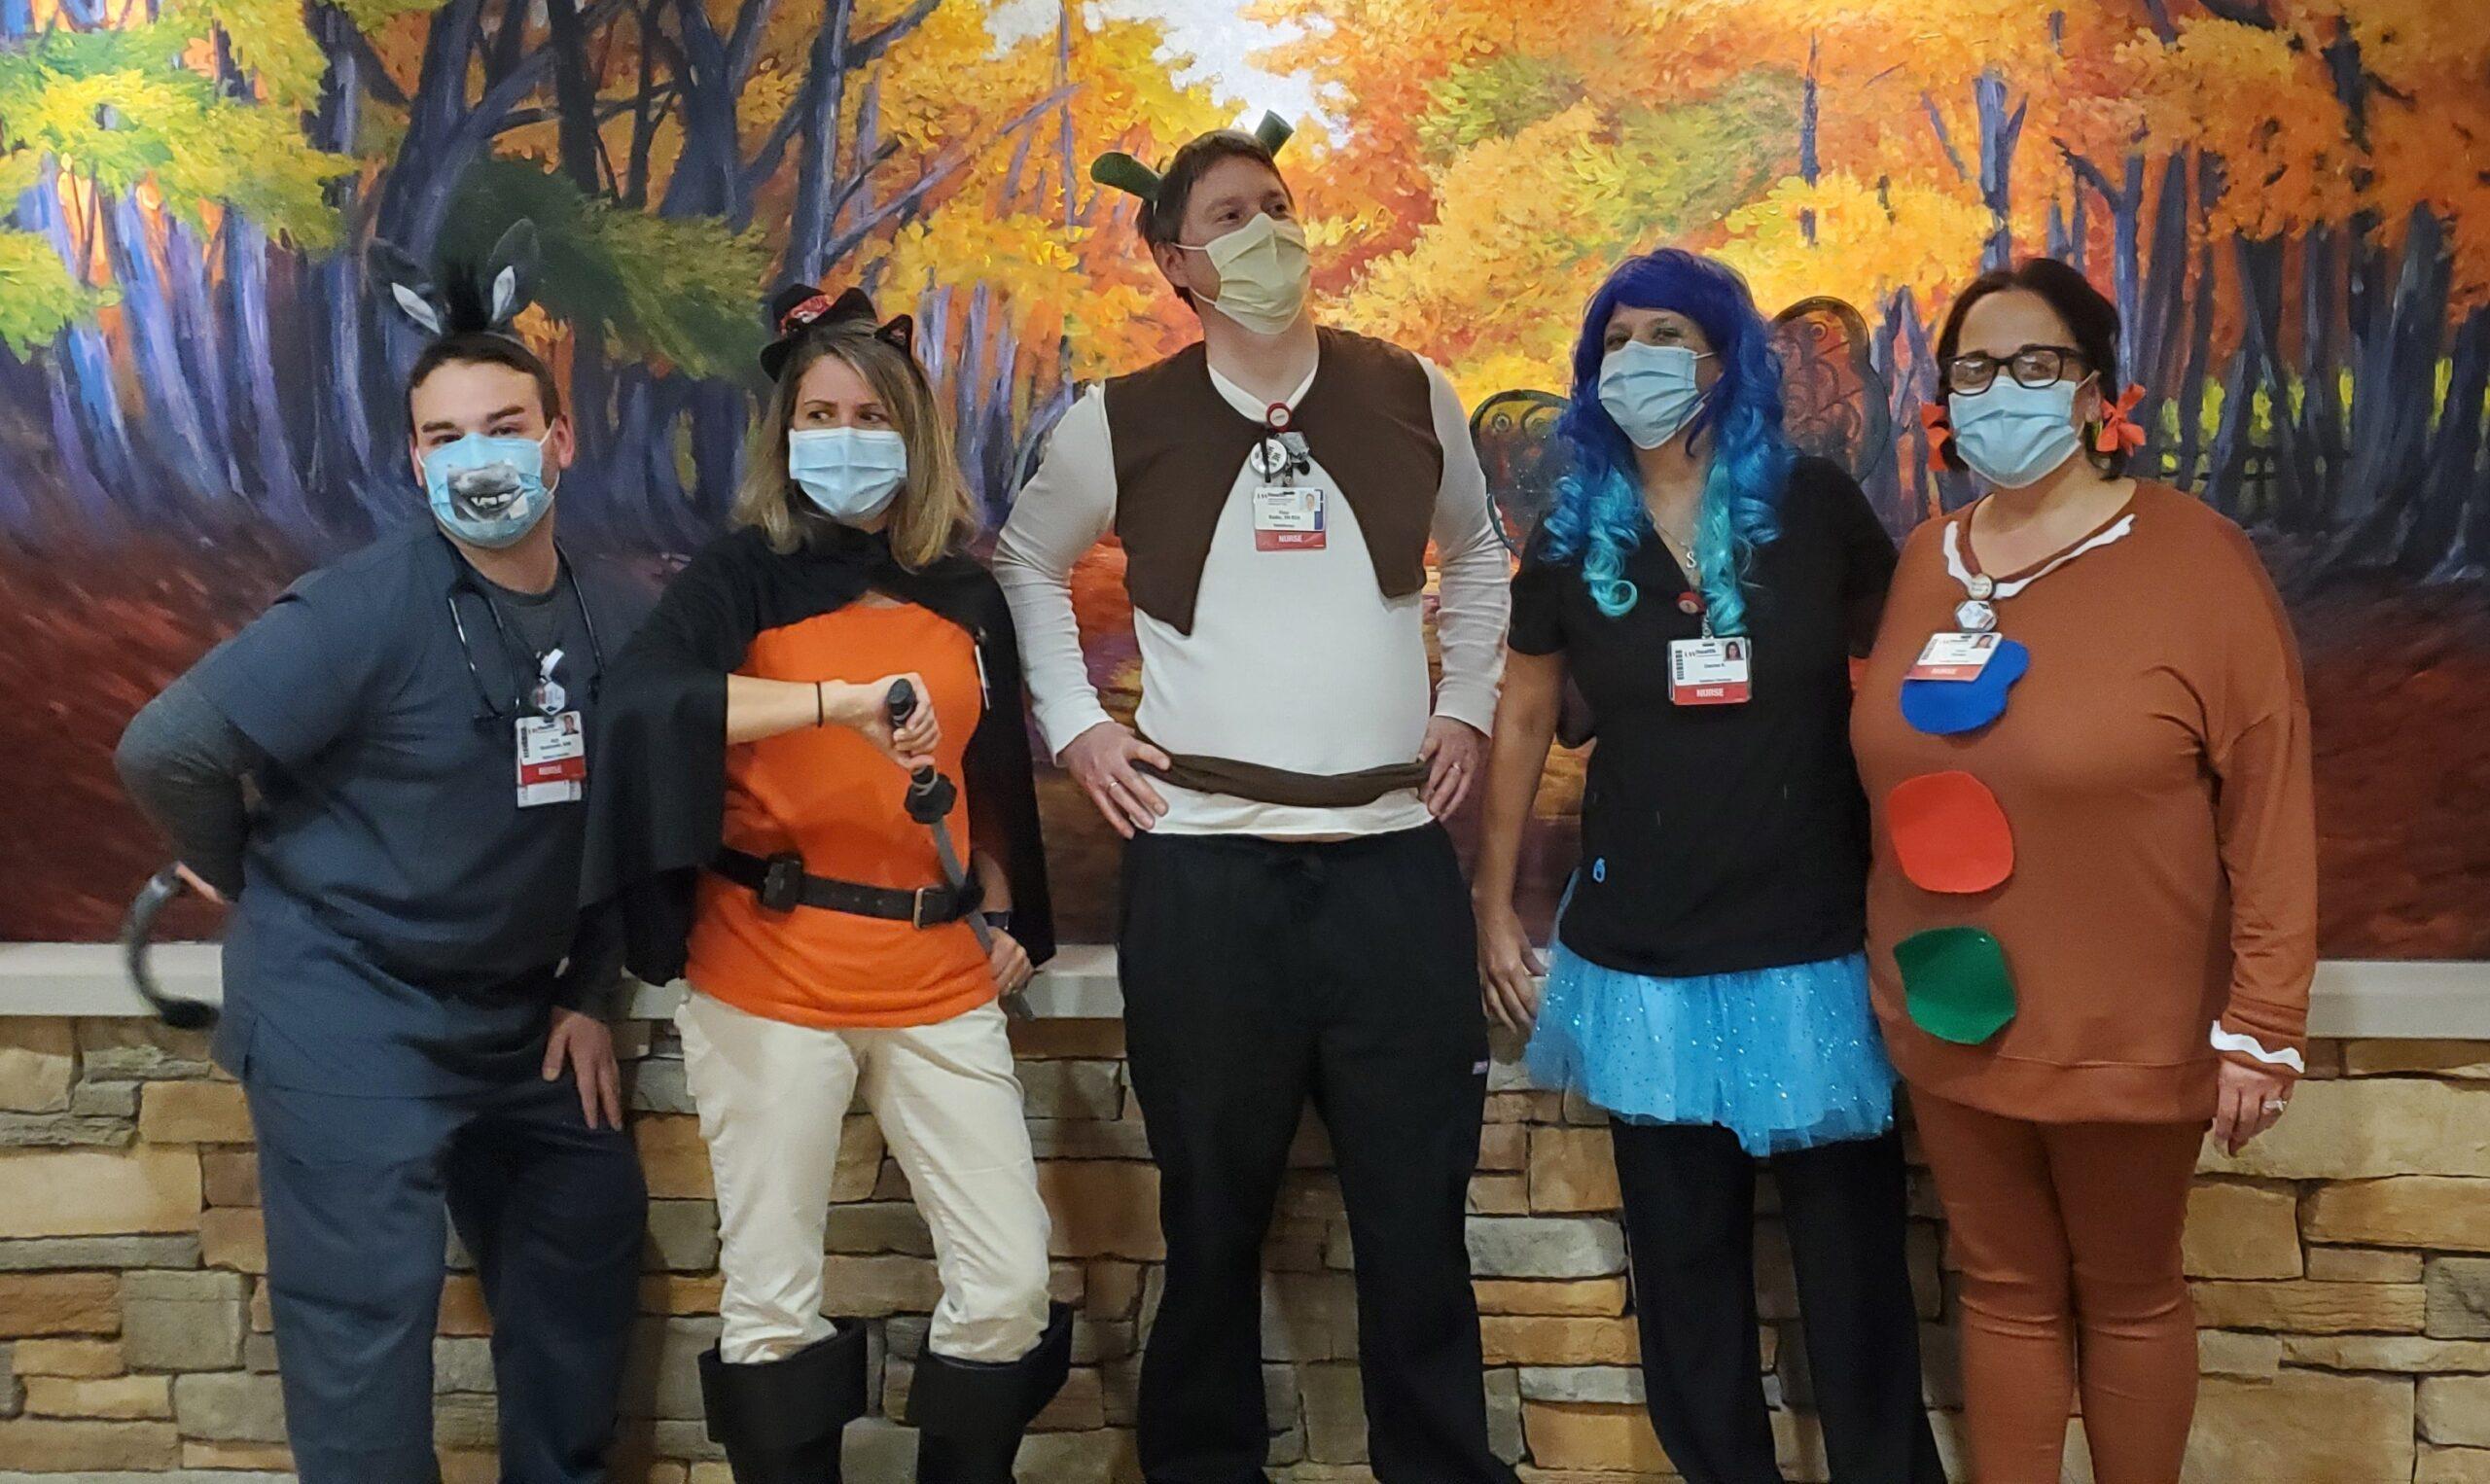 2020 Halloween Costumes